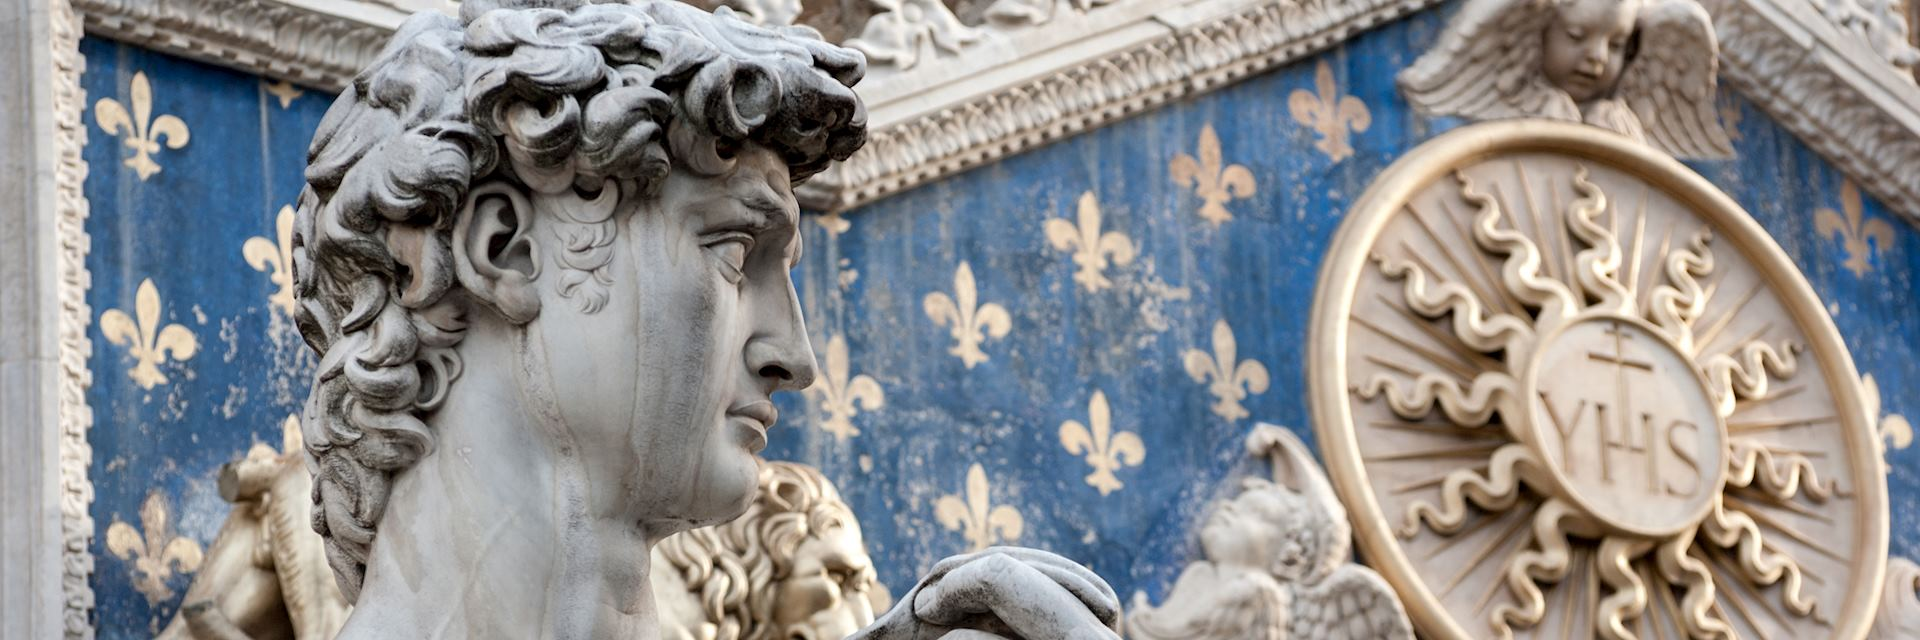 Michelangelo's statue of David, Florence